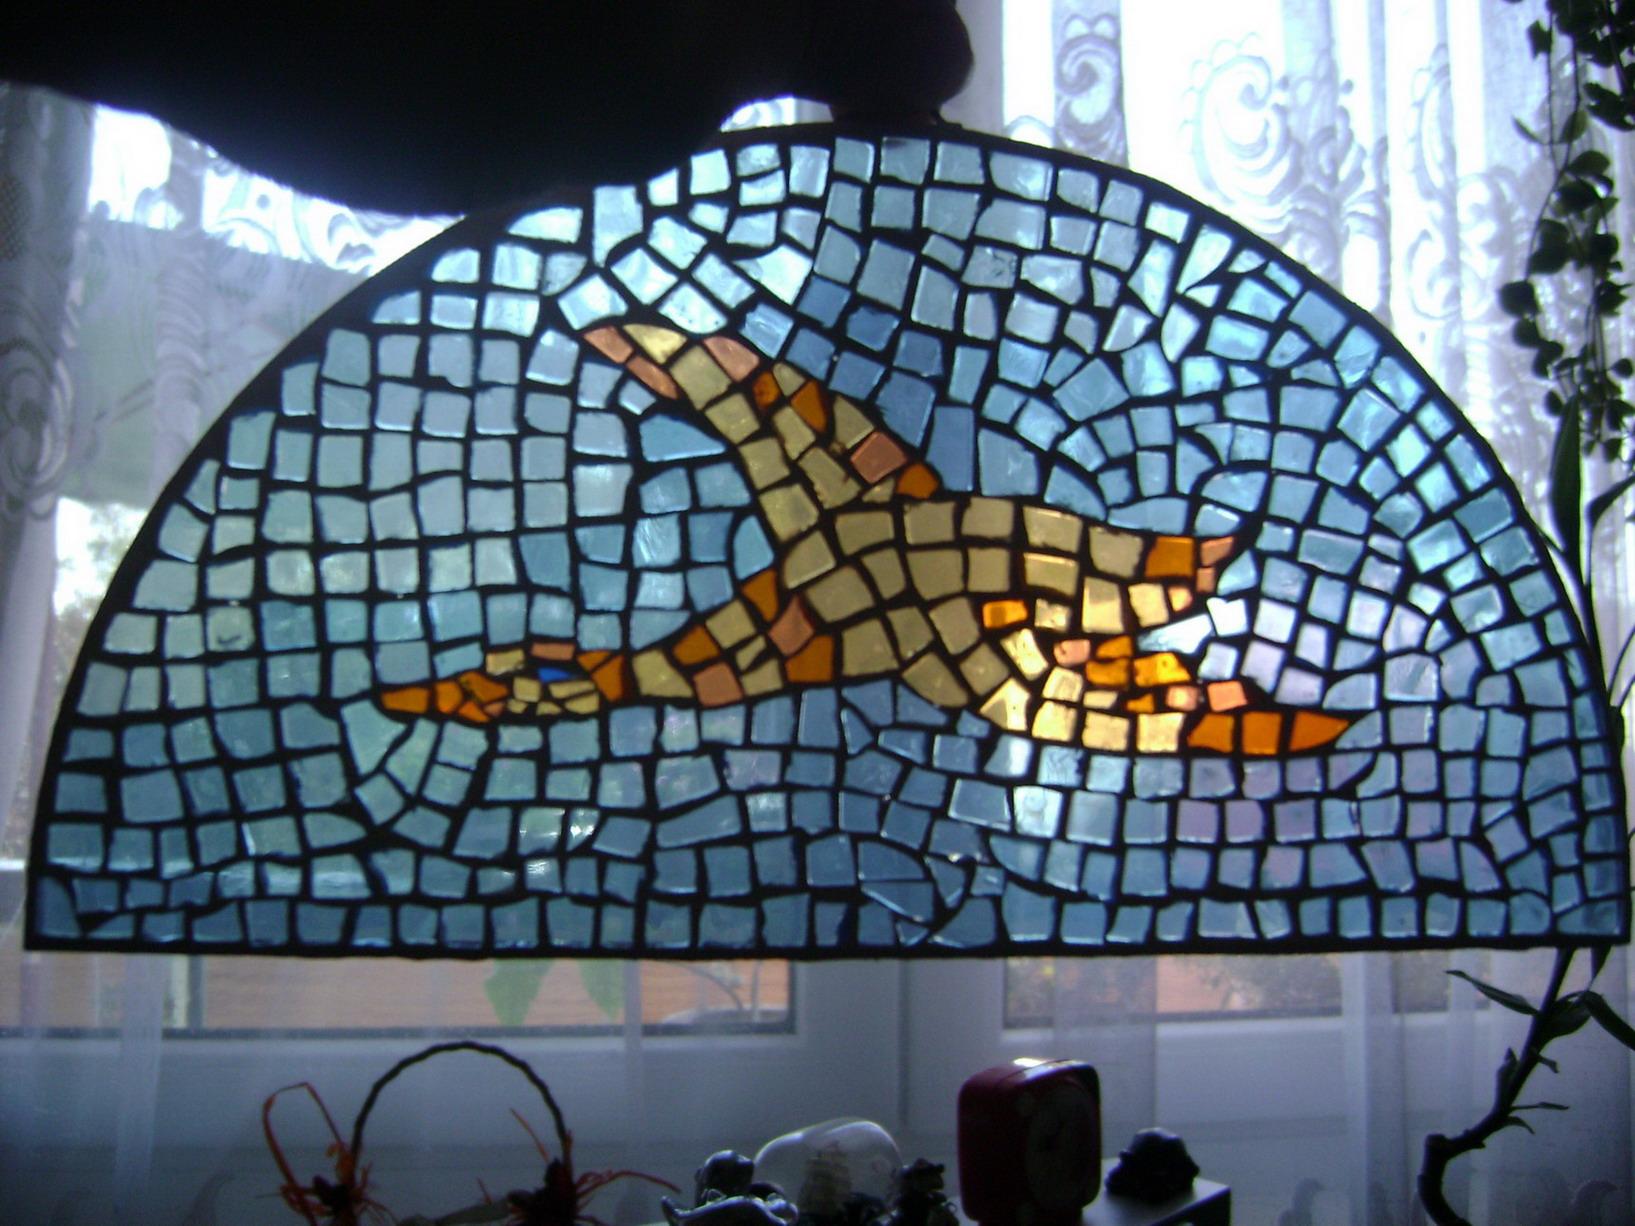 Kreatív hobby: mozaik (kép)